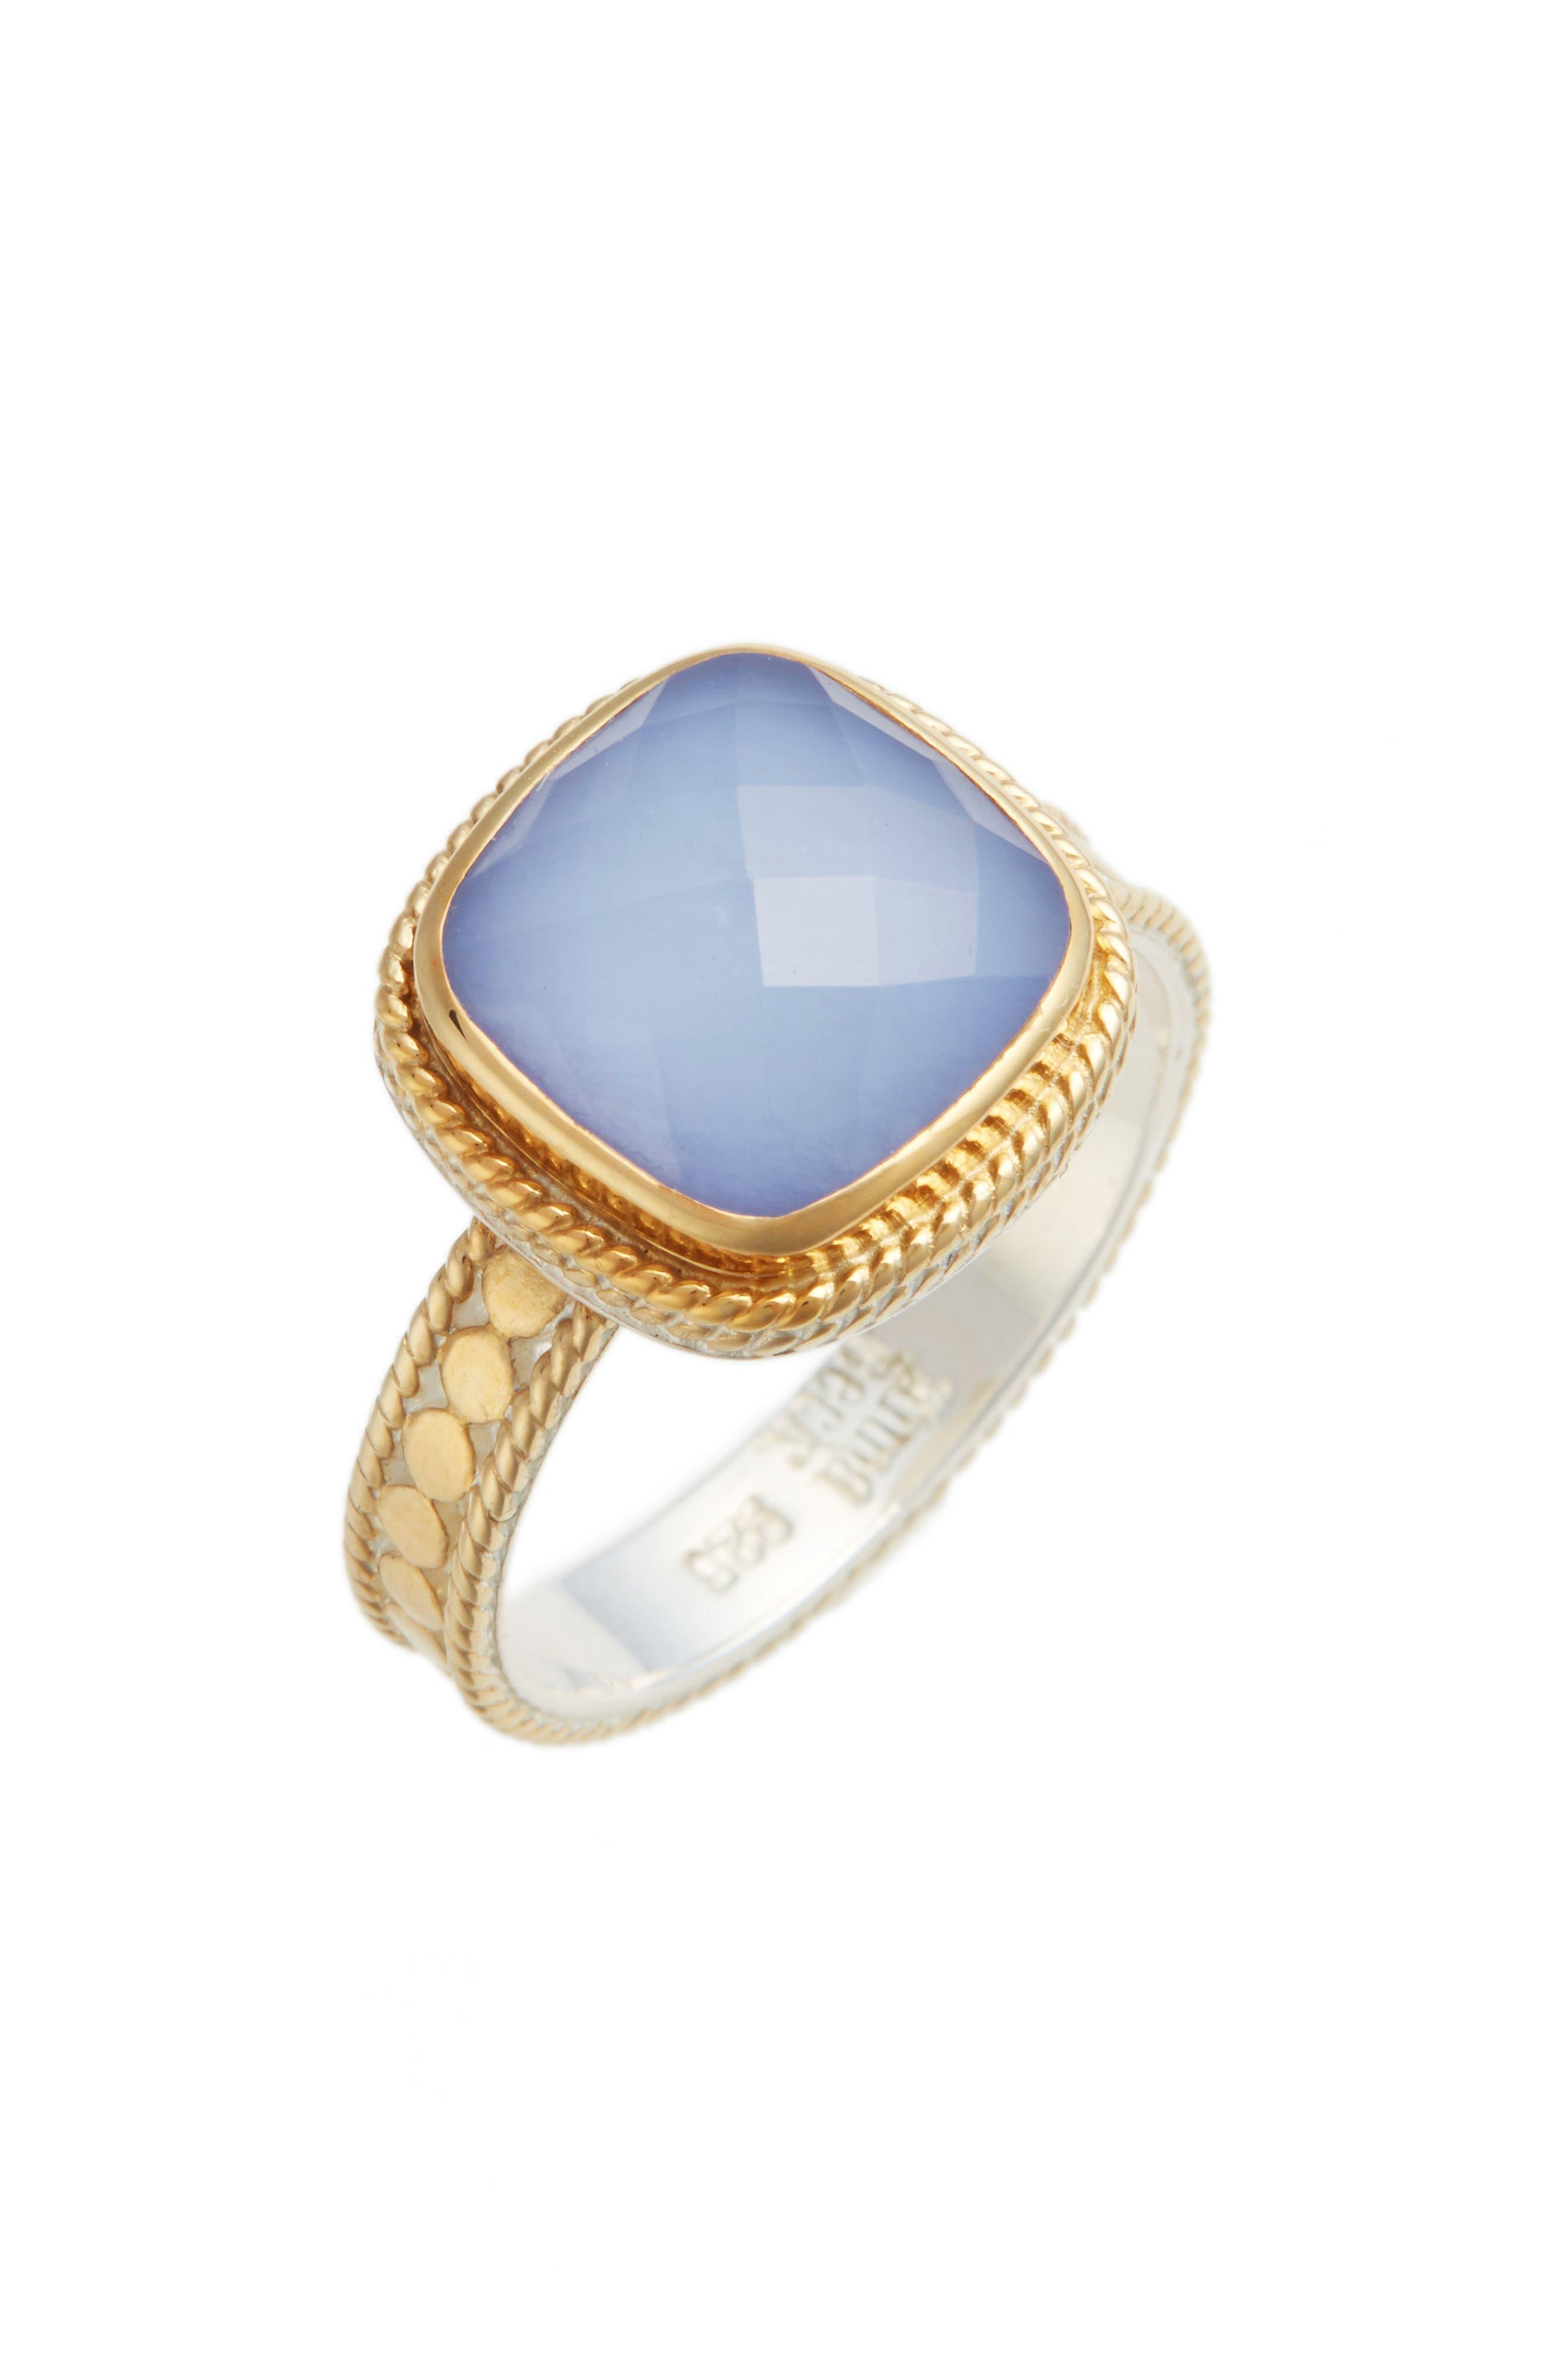 Main Image - Anna Beck Blue Chalcedony Cushion Ring